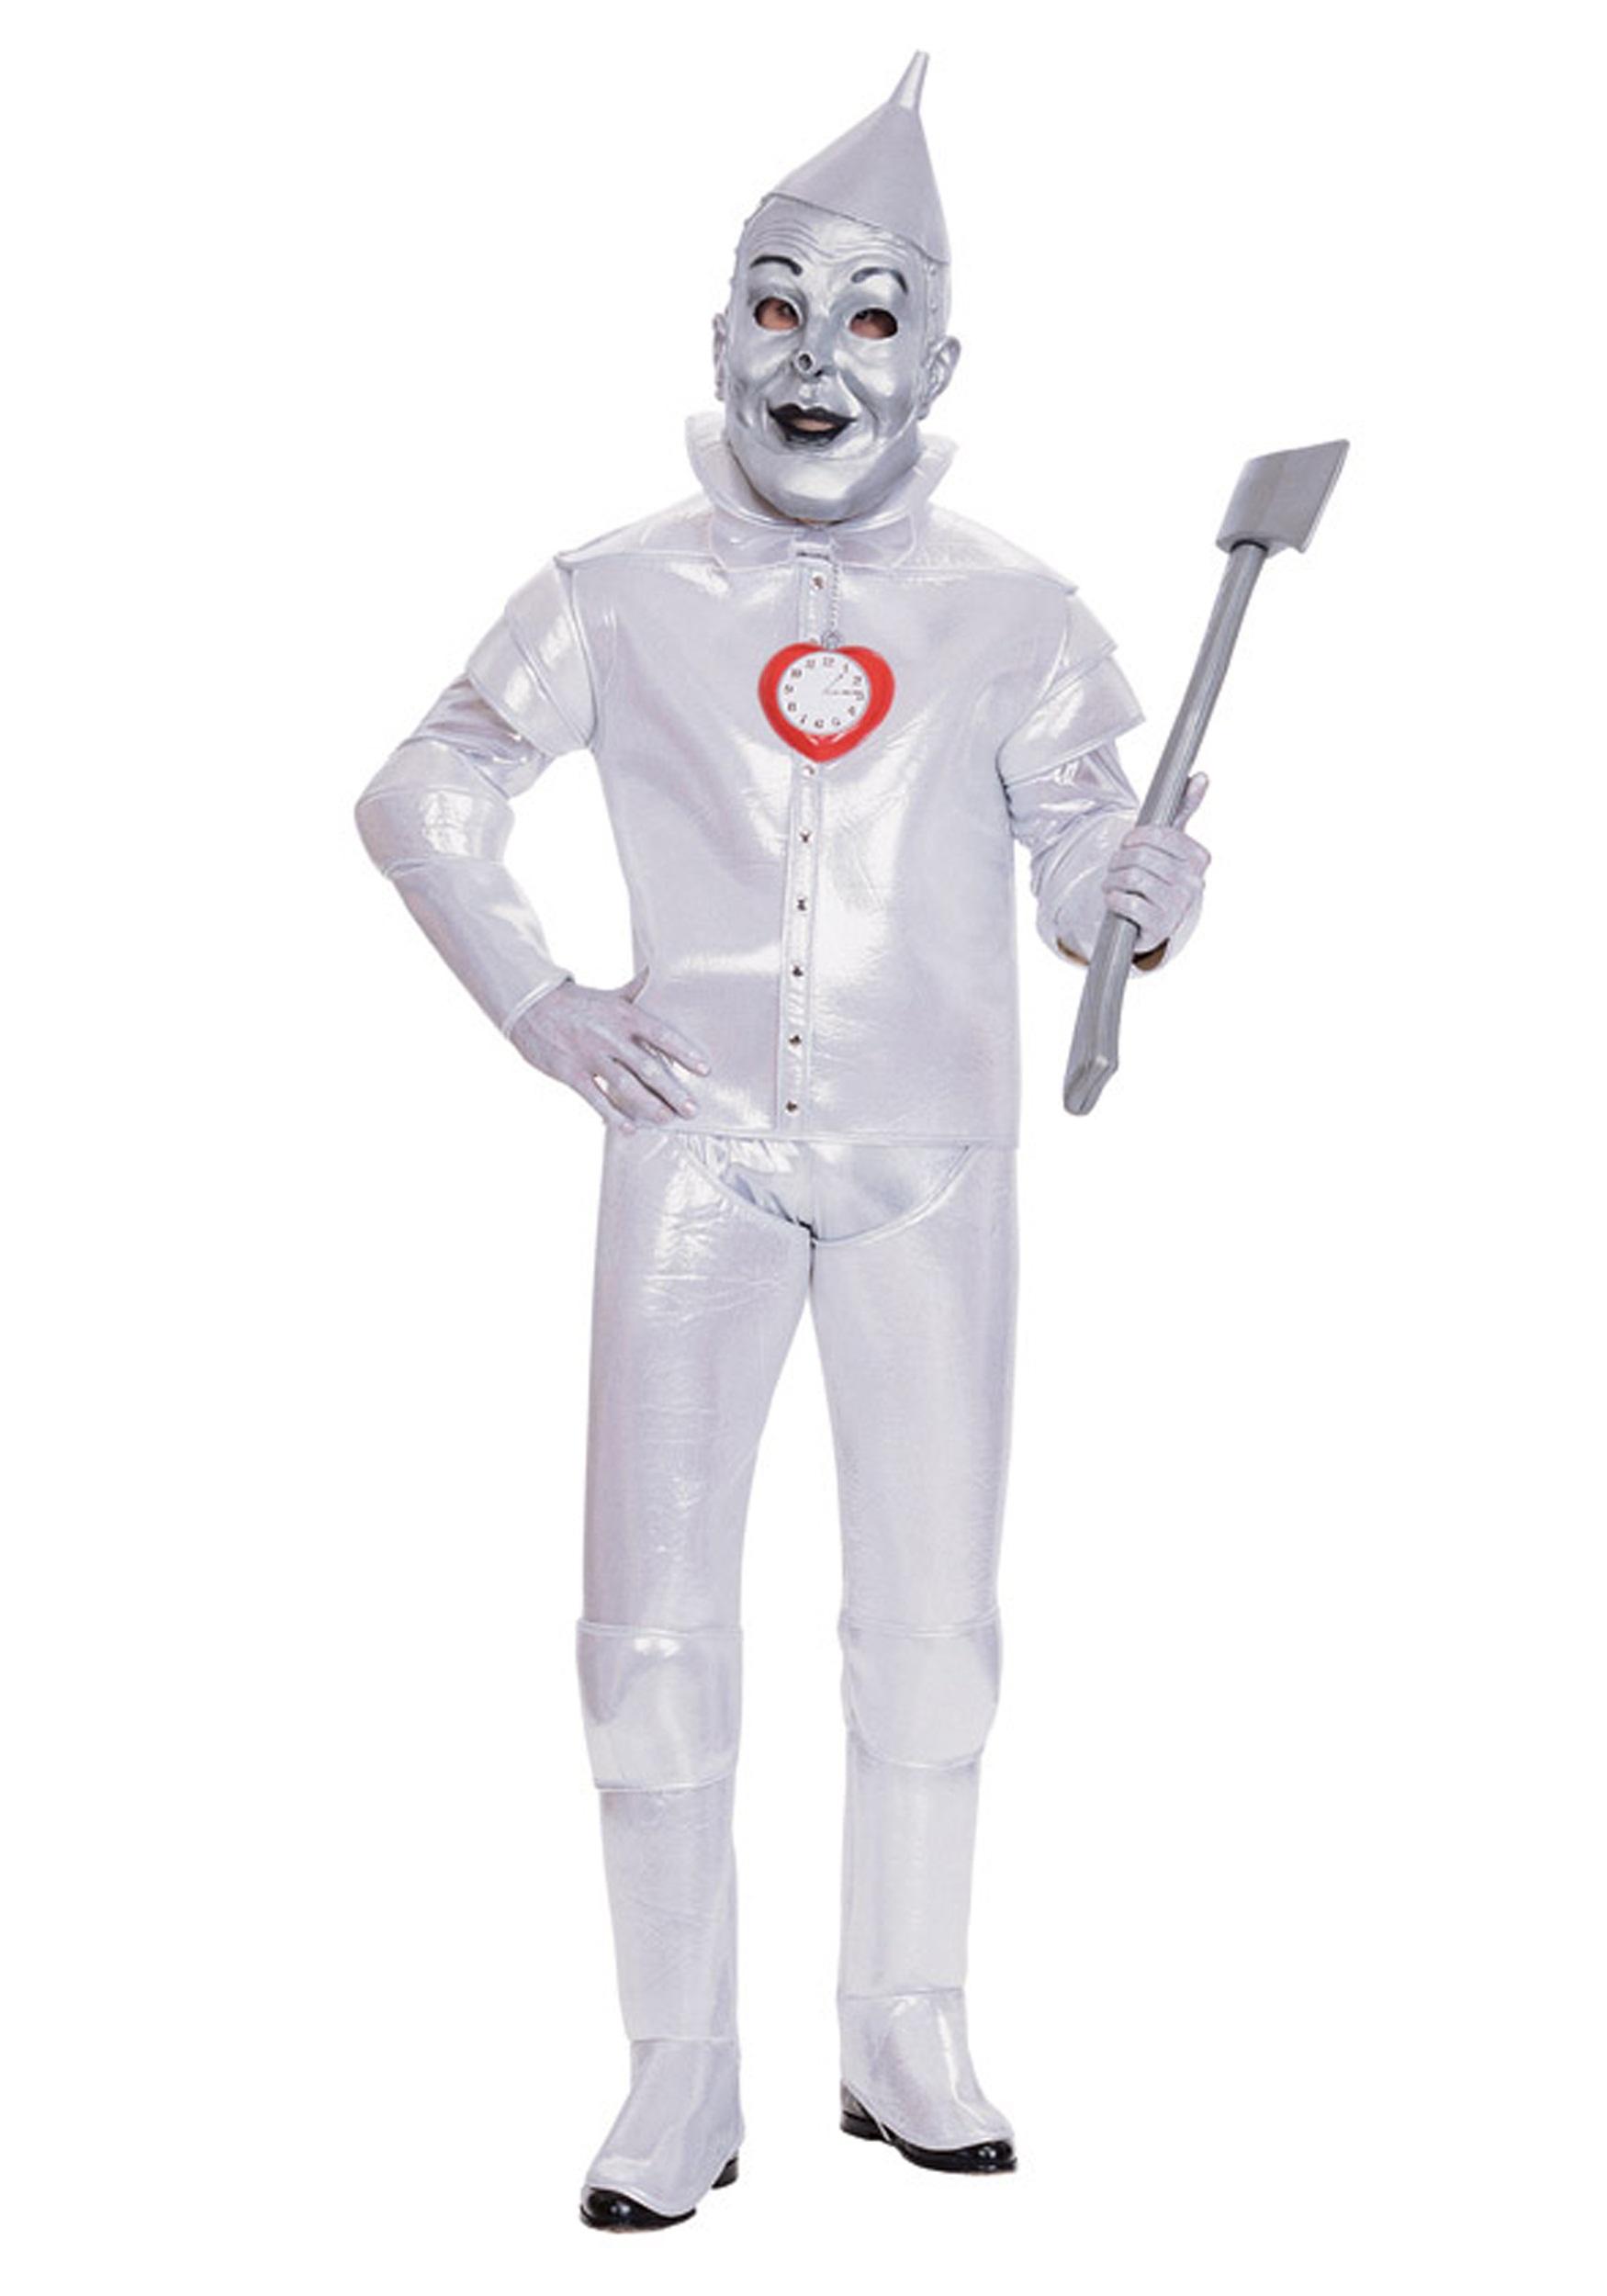 Tin Man Grand Heritage Costume  sc 1 st  Halloween Costumes & Tin Man Grand Heritage Costume - Halloween Costumes